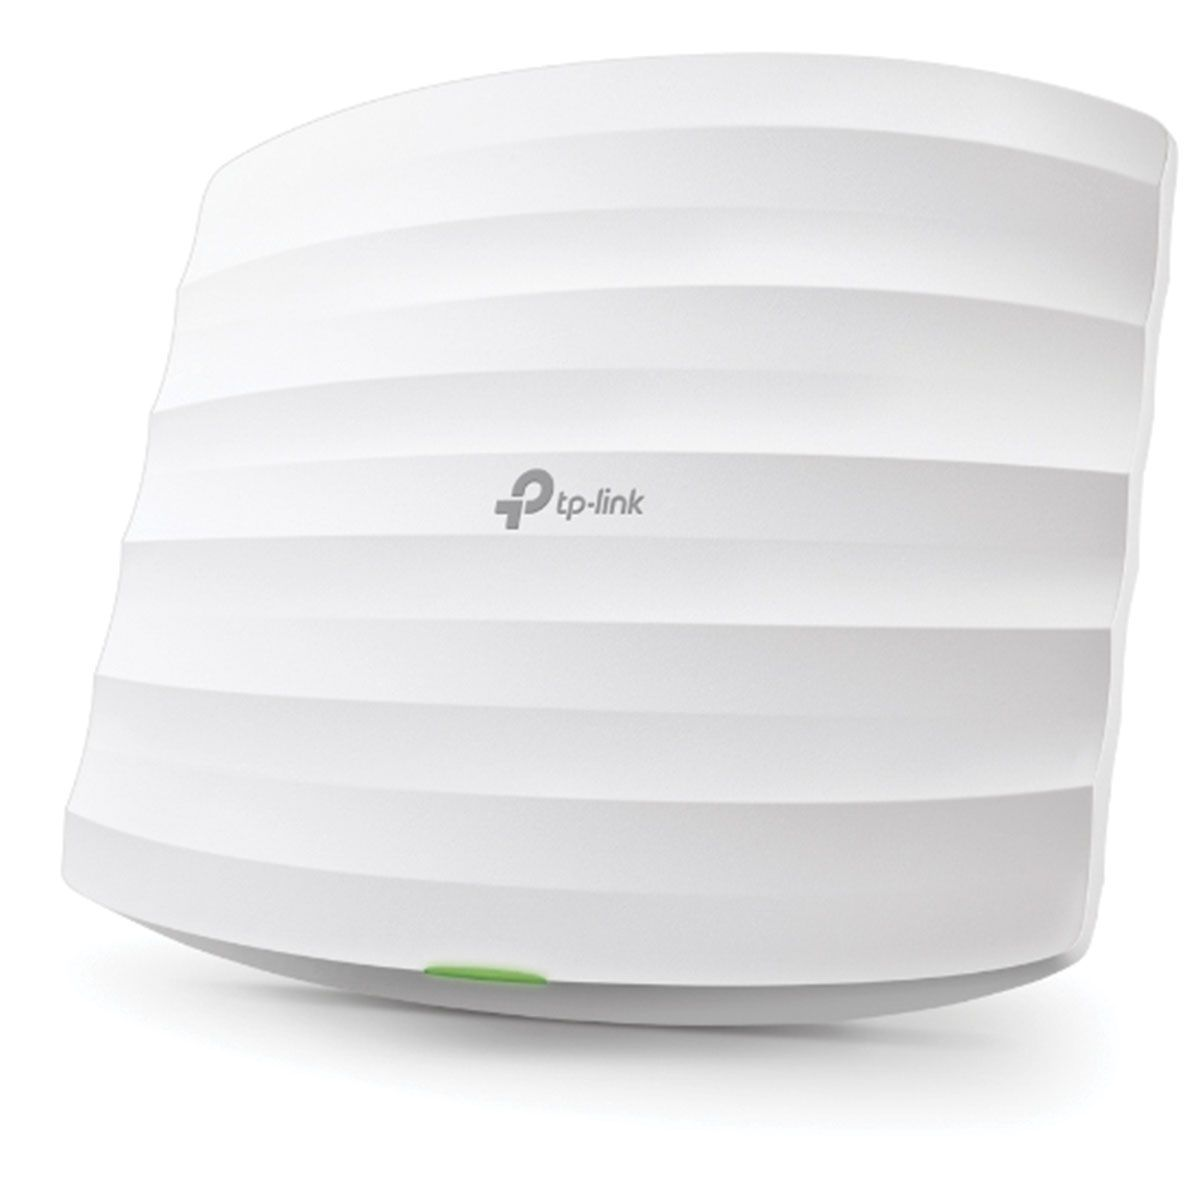 Access Point Wireless Gigabit MU-MIMO Montavel em Teto 2.4GHZ e 5GHZ AC1750 EAP245